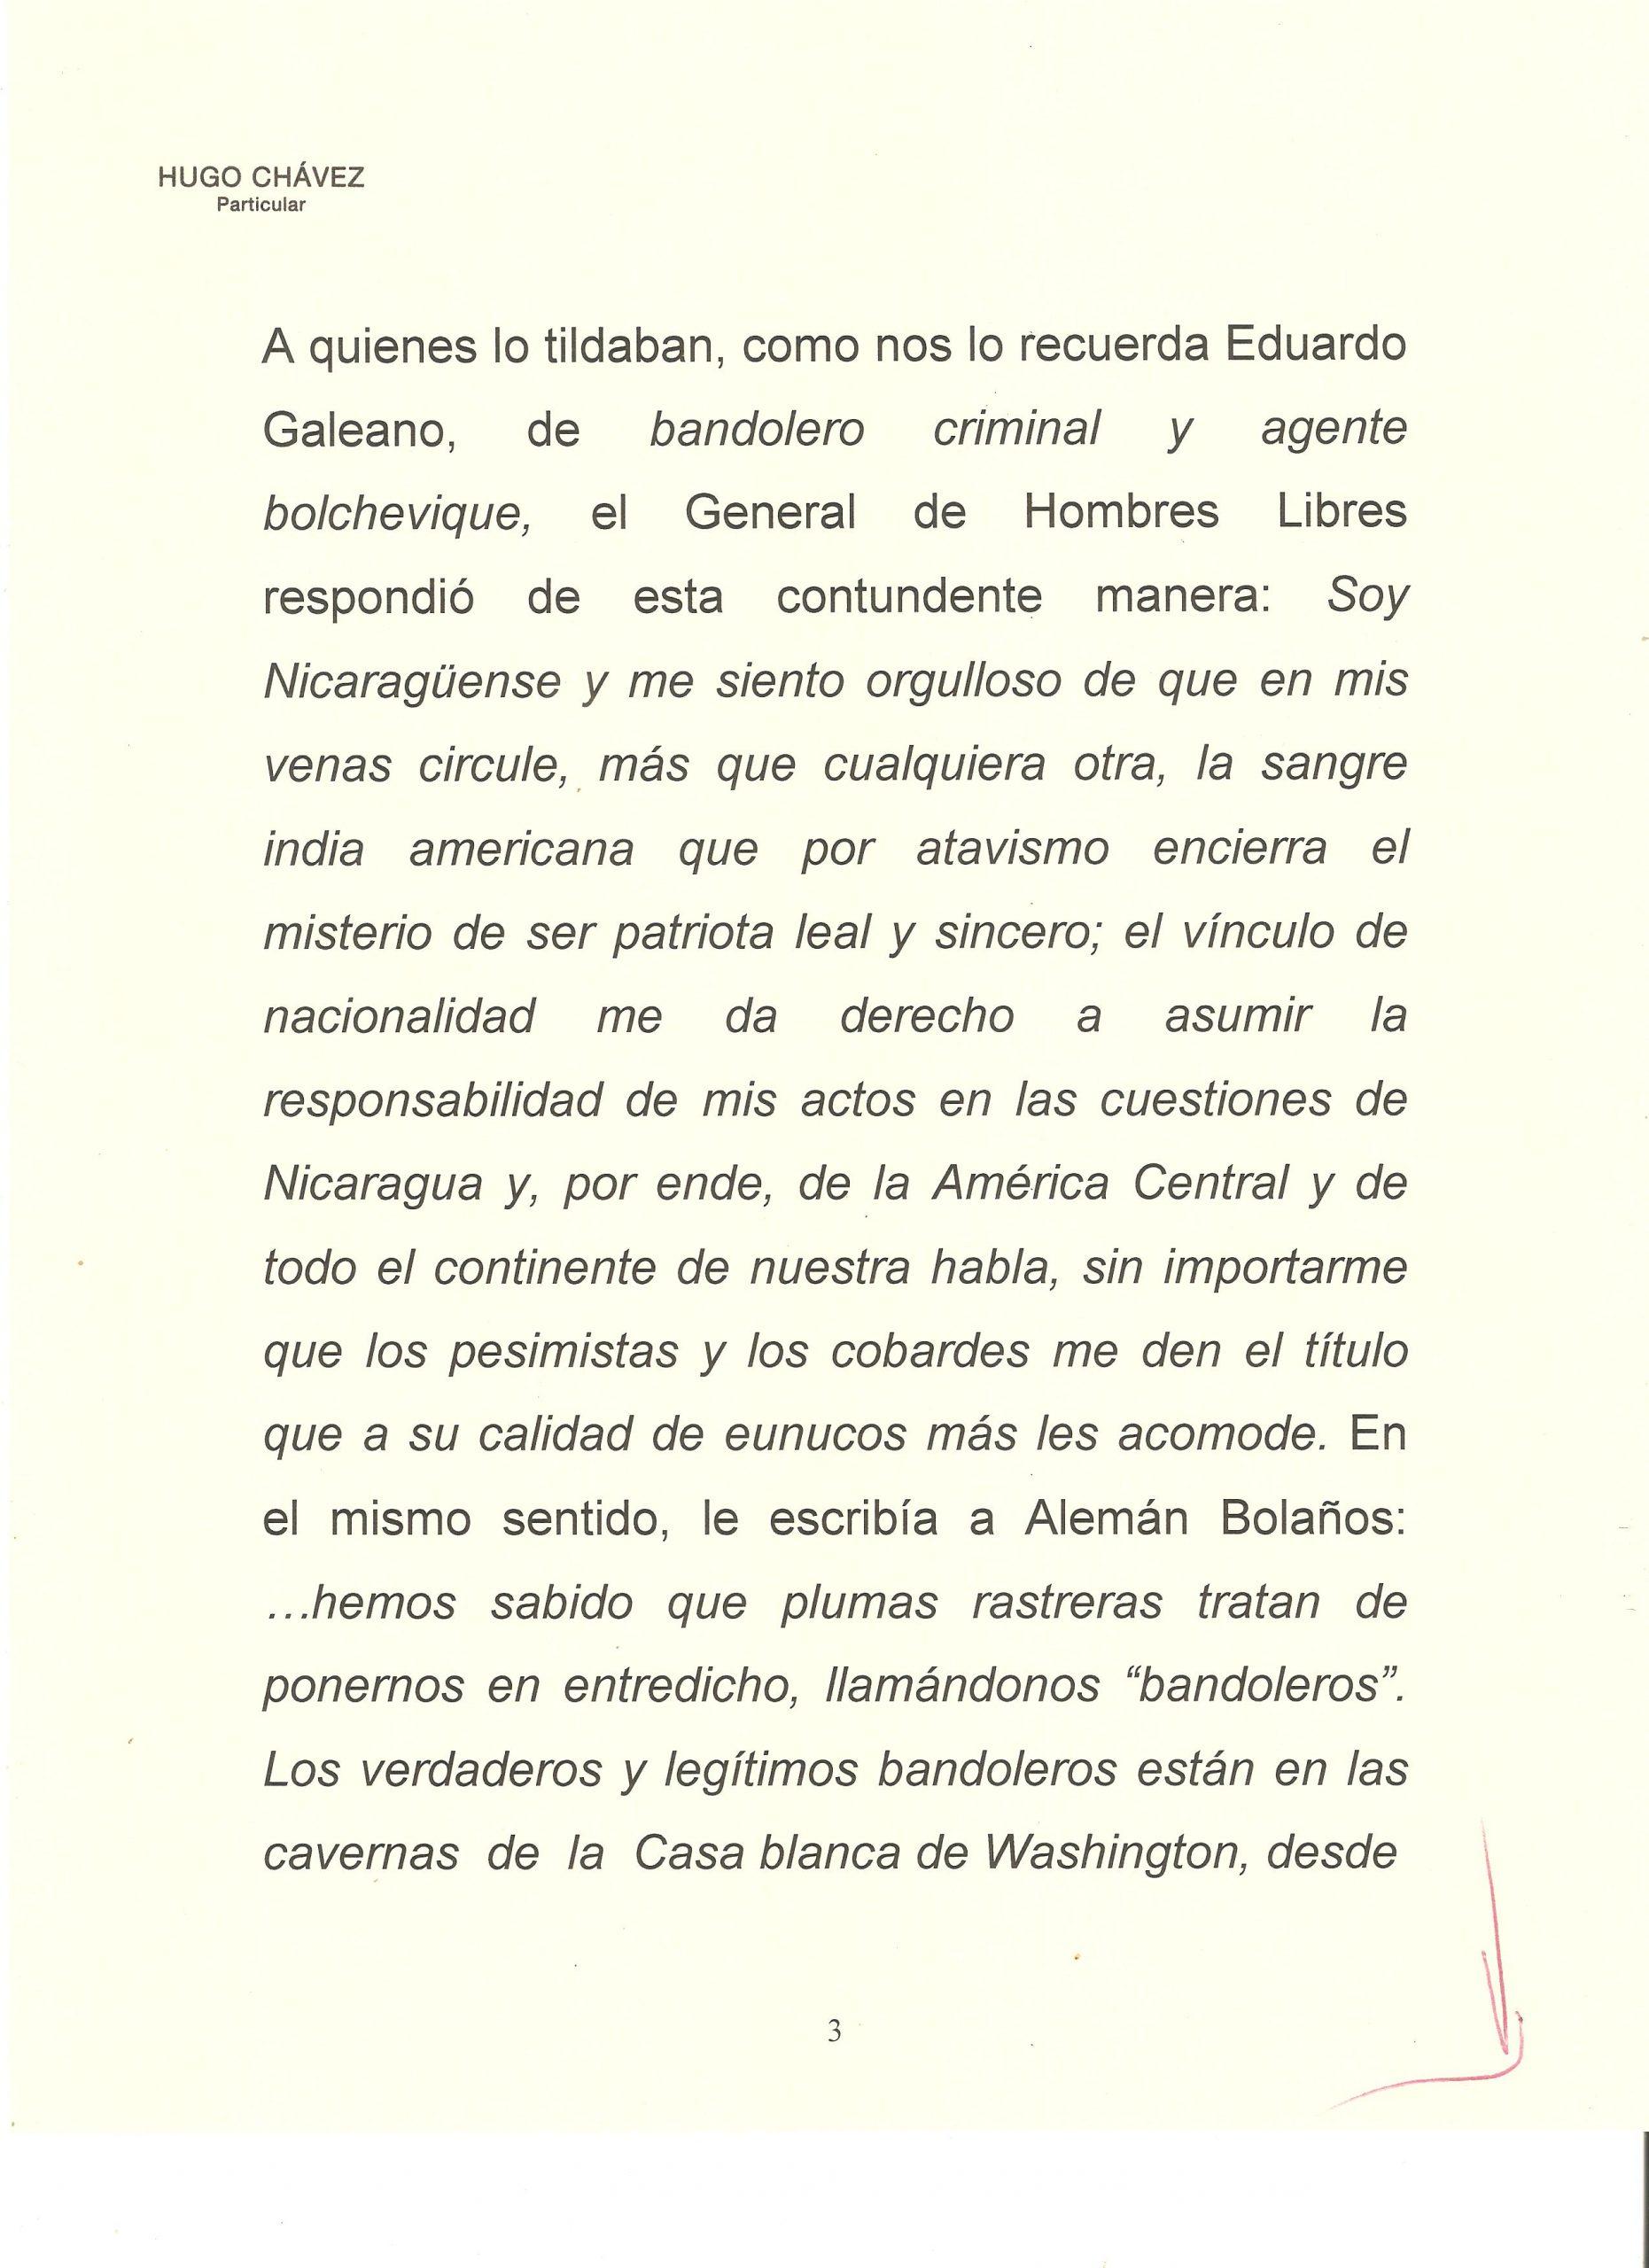 PROLOGO DE HUGO CHAVEZ A WALTER 3